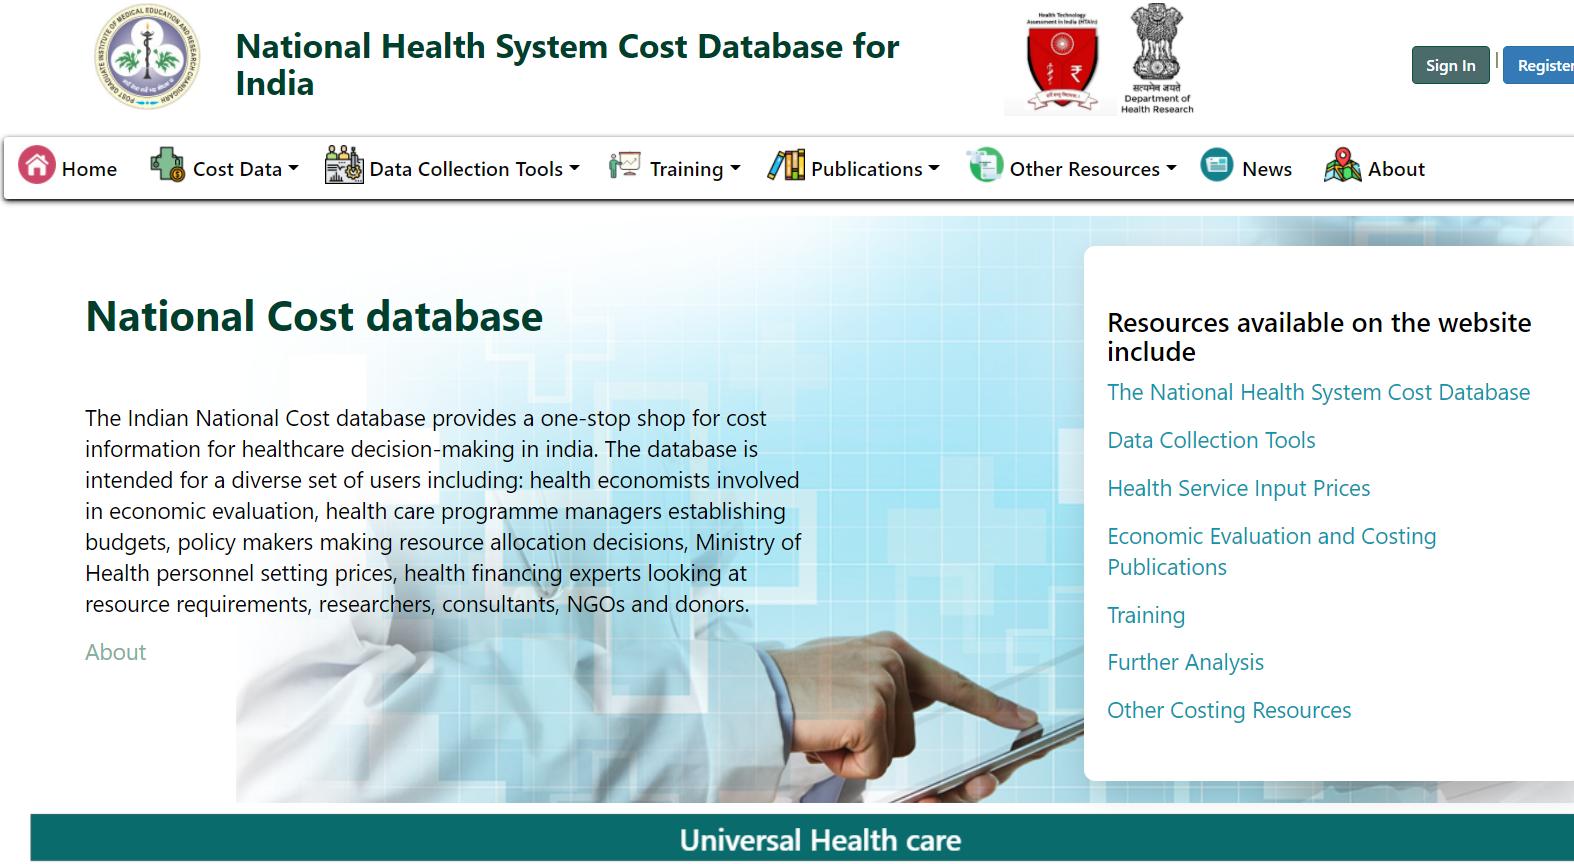 A screenshot of a health costing database